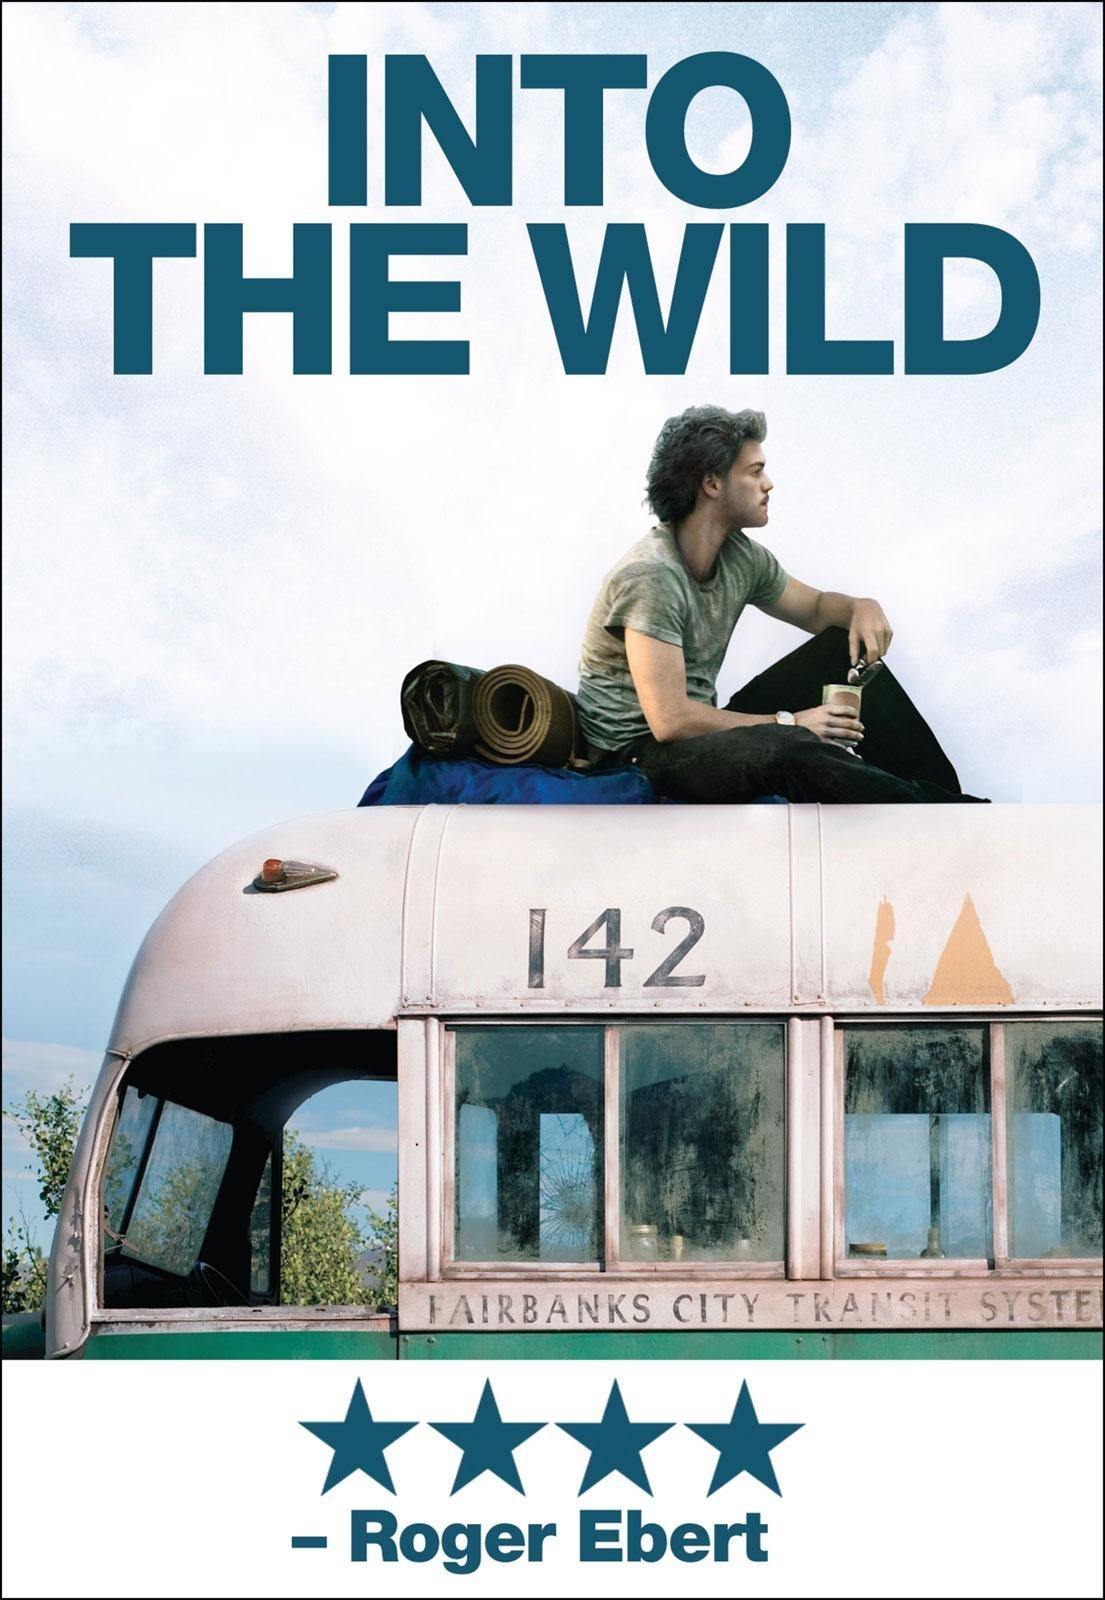 Reis inspiratie films - INTO THE WILD